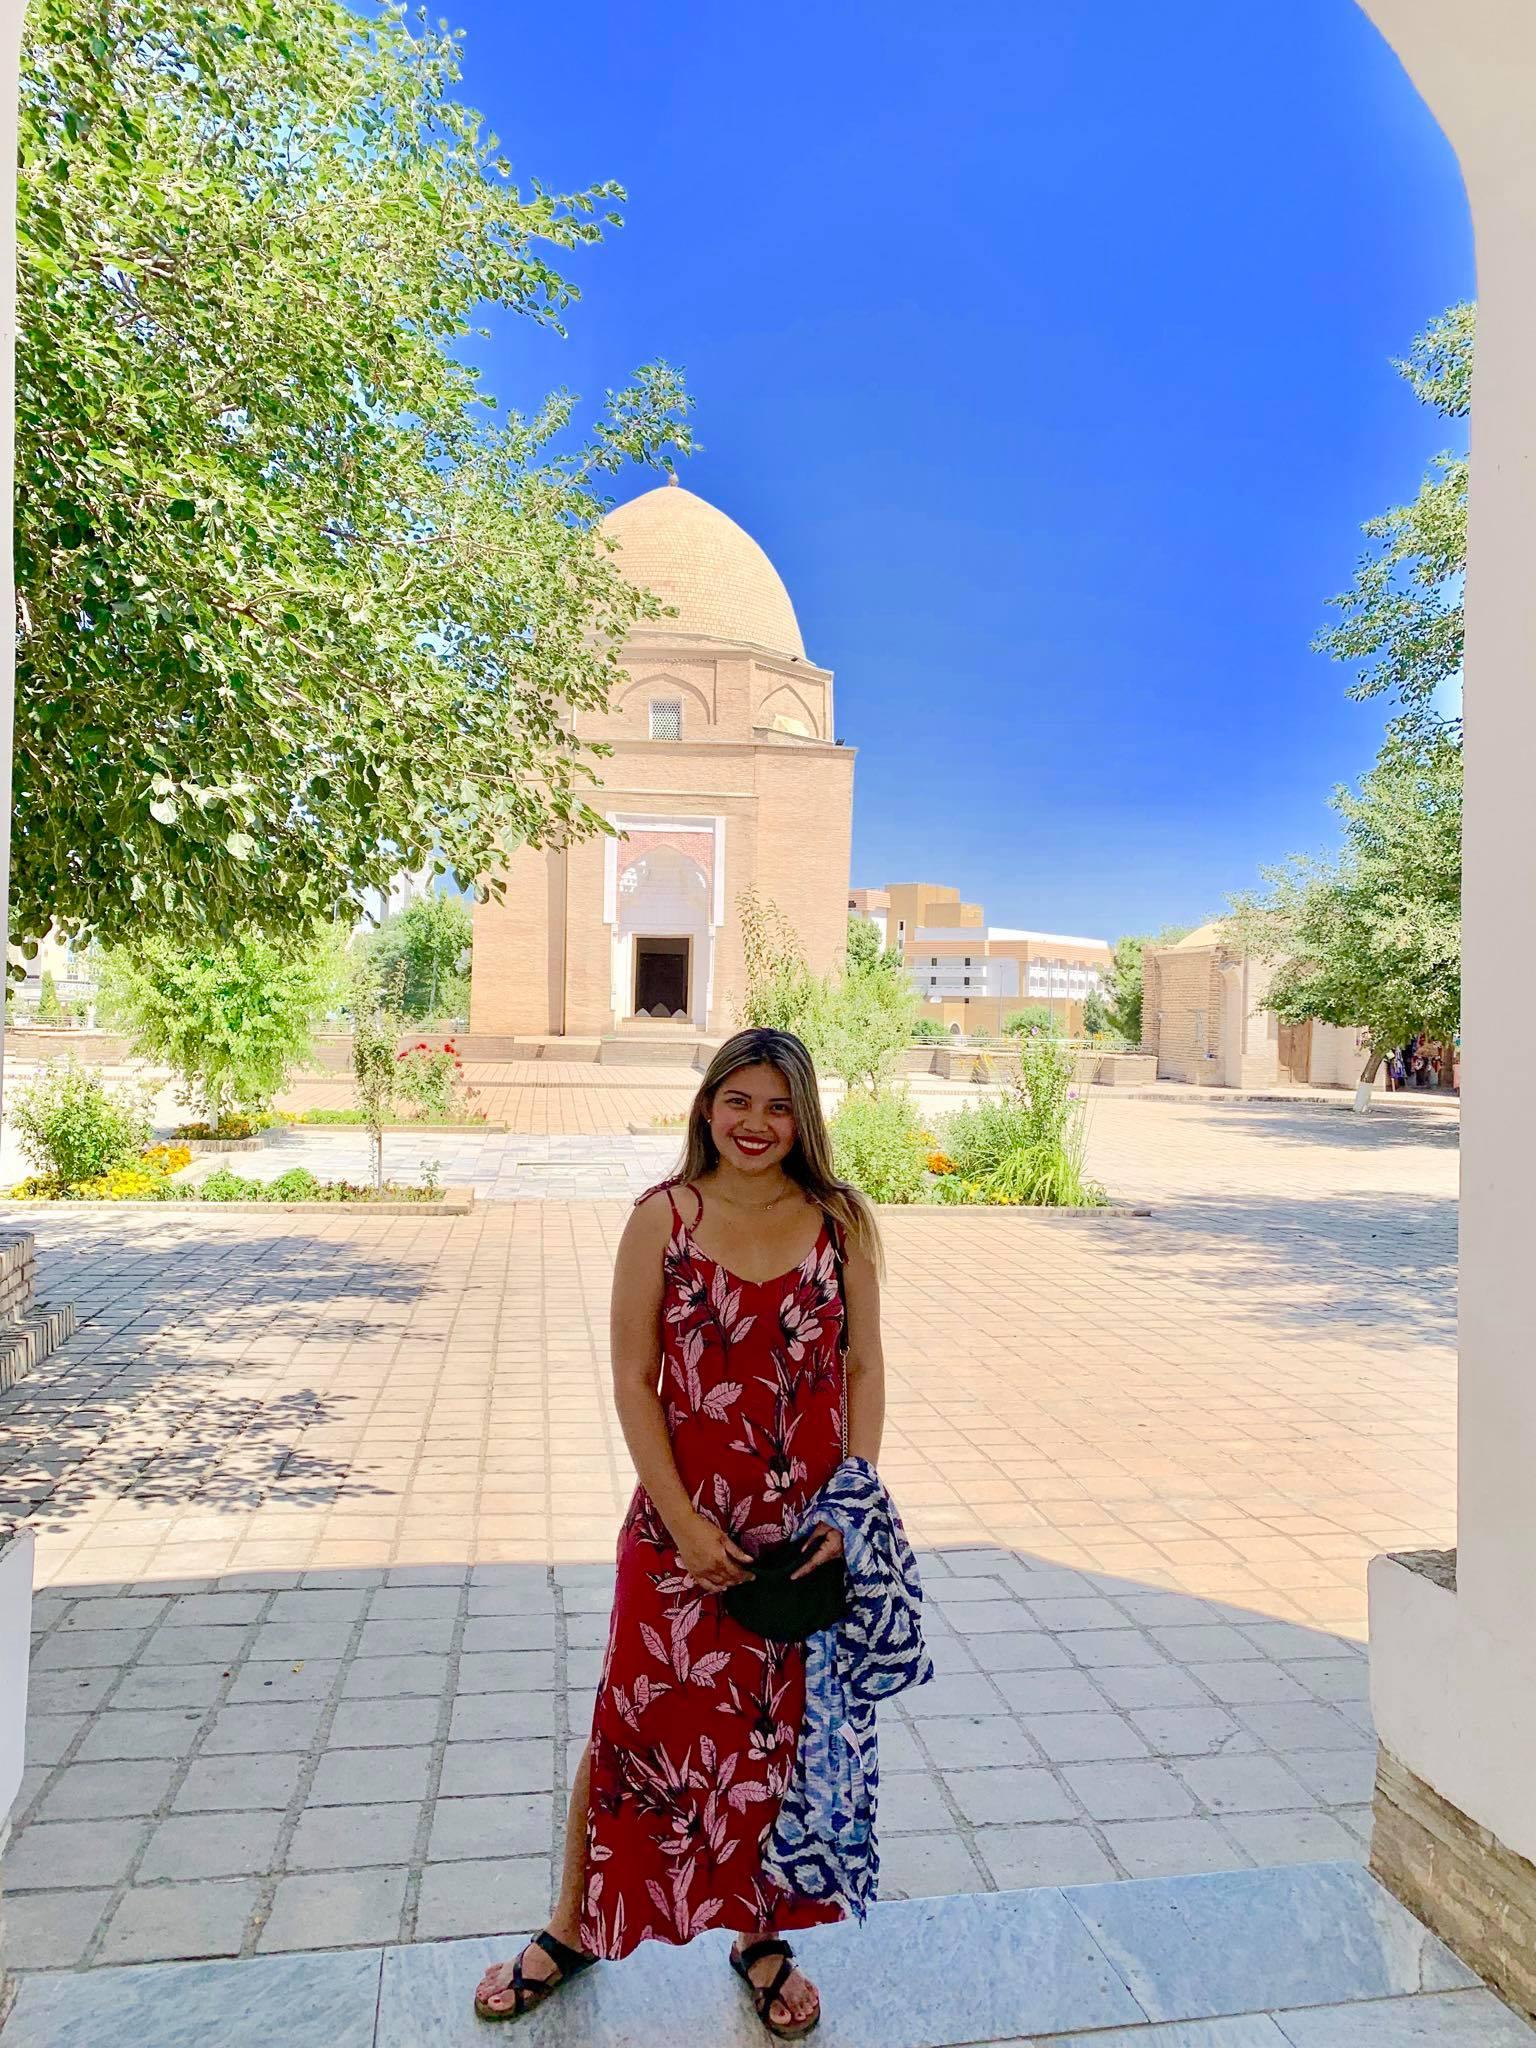 Kach Solo Travels in 2019 Siyab Bazaar and Registan on my first day in Samarkand5.jpg